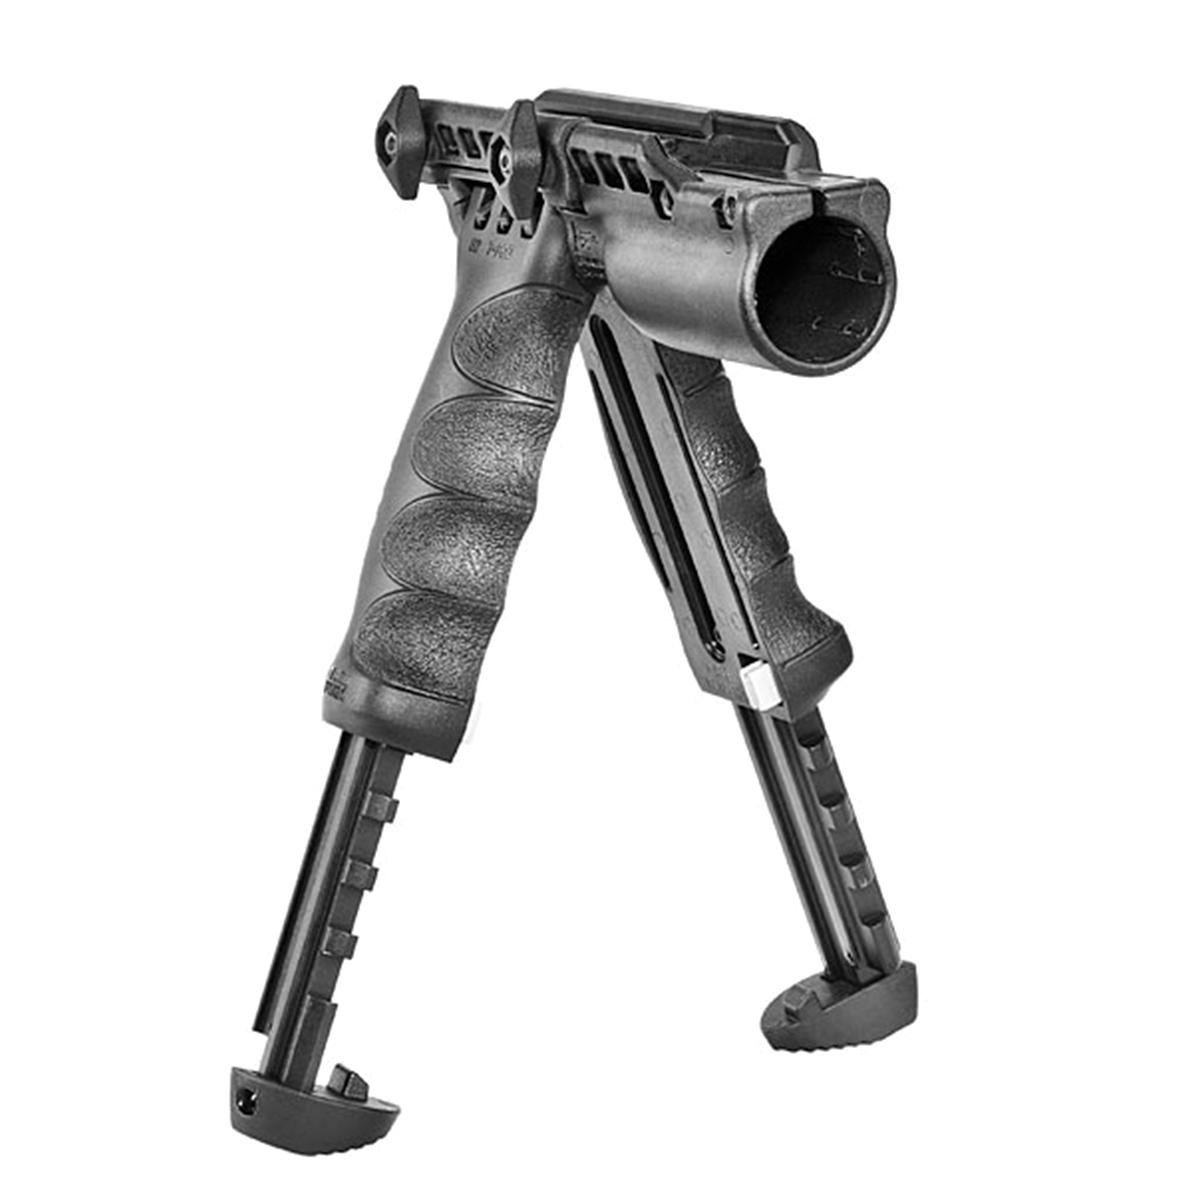 FAB Defense Bi-pod T-POD-G2-FA flashlight holder